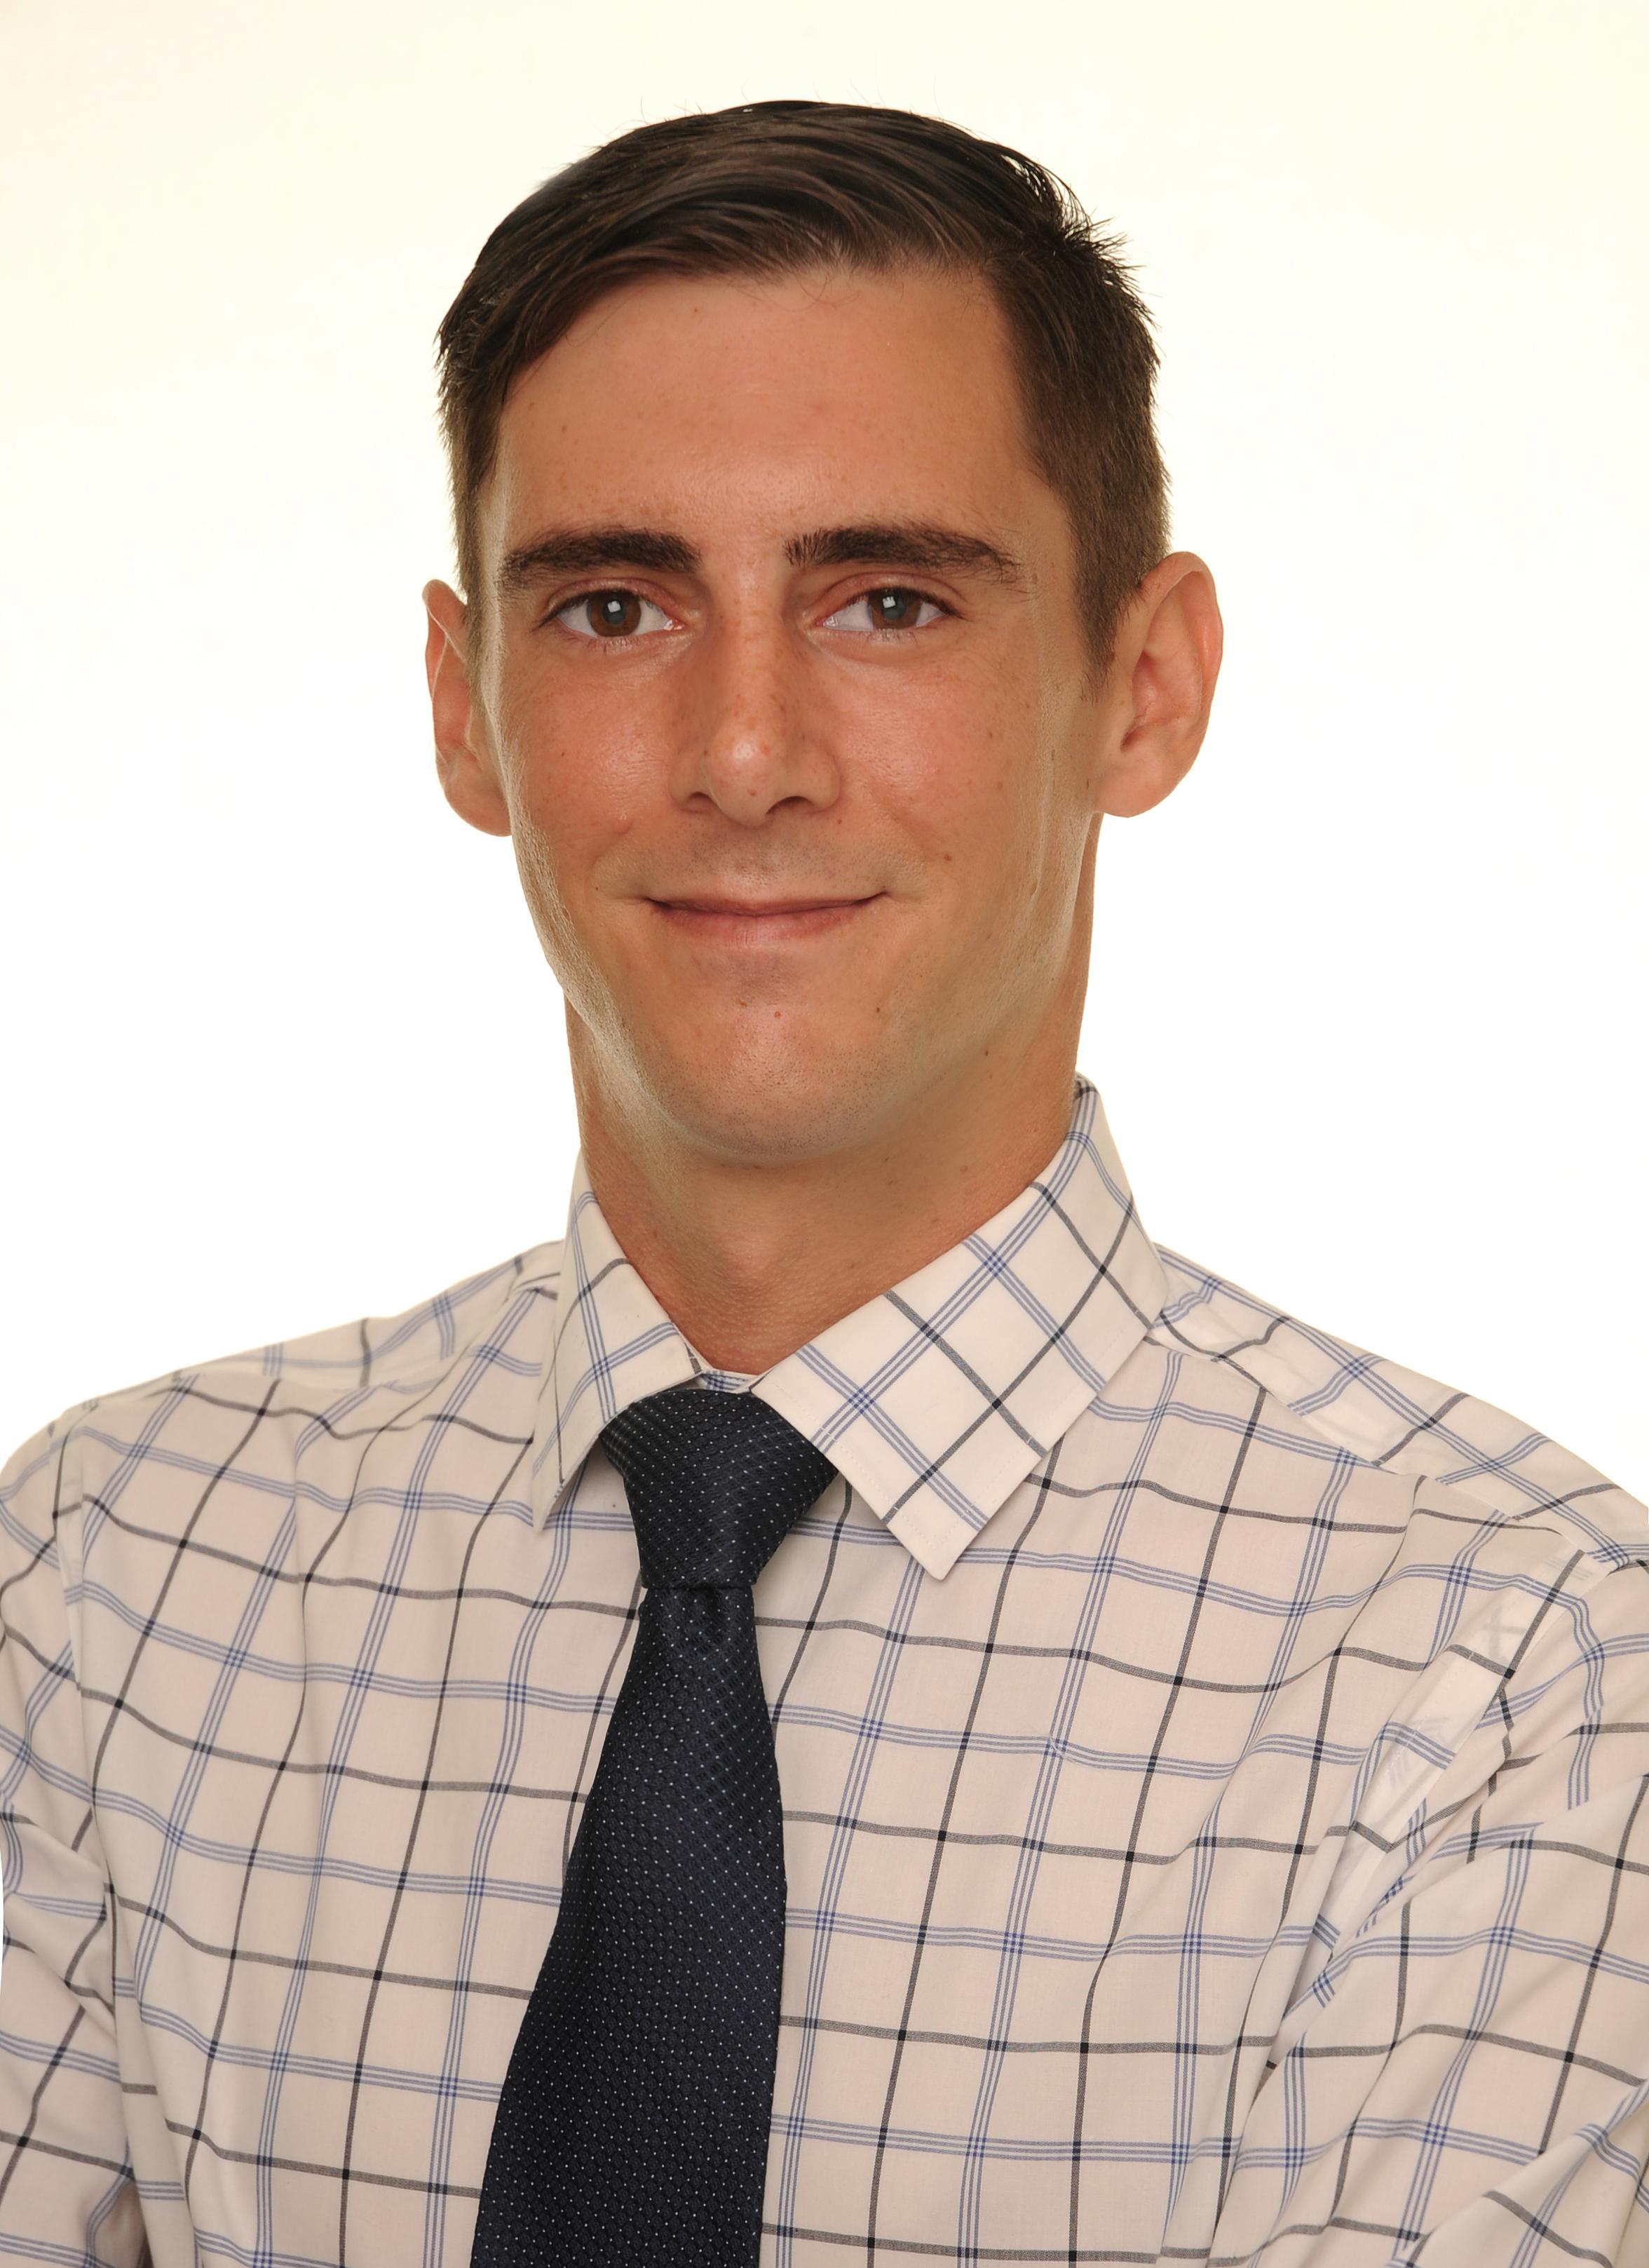 David Evans, Executive Assistant for the Matt Rhine Group